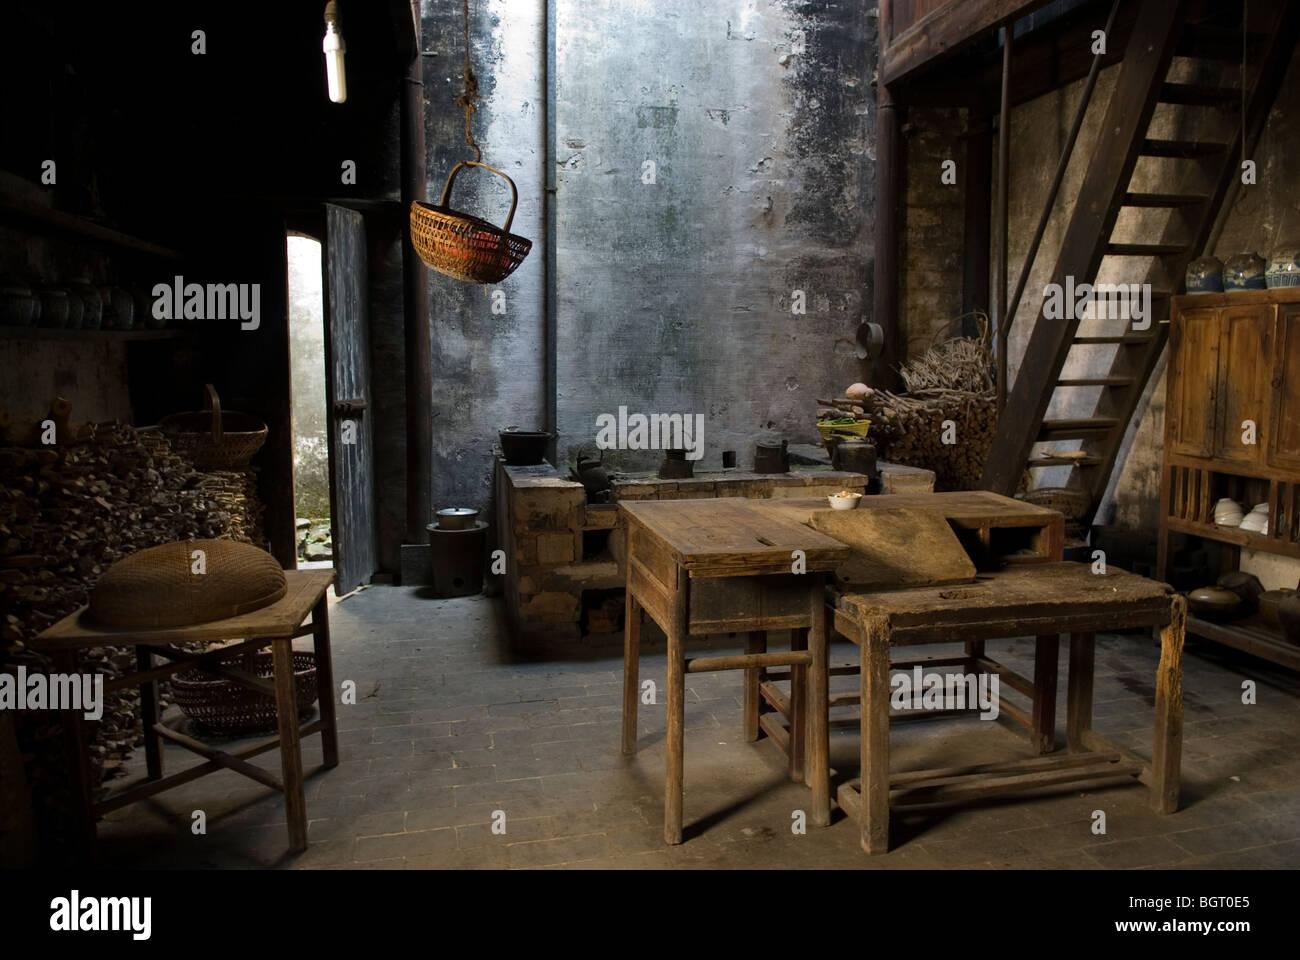 Kitchen of old merchant's house. Nanping, Anhui province. China. - Stock Image